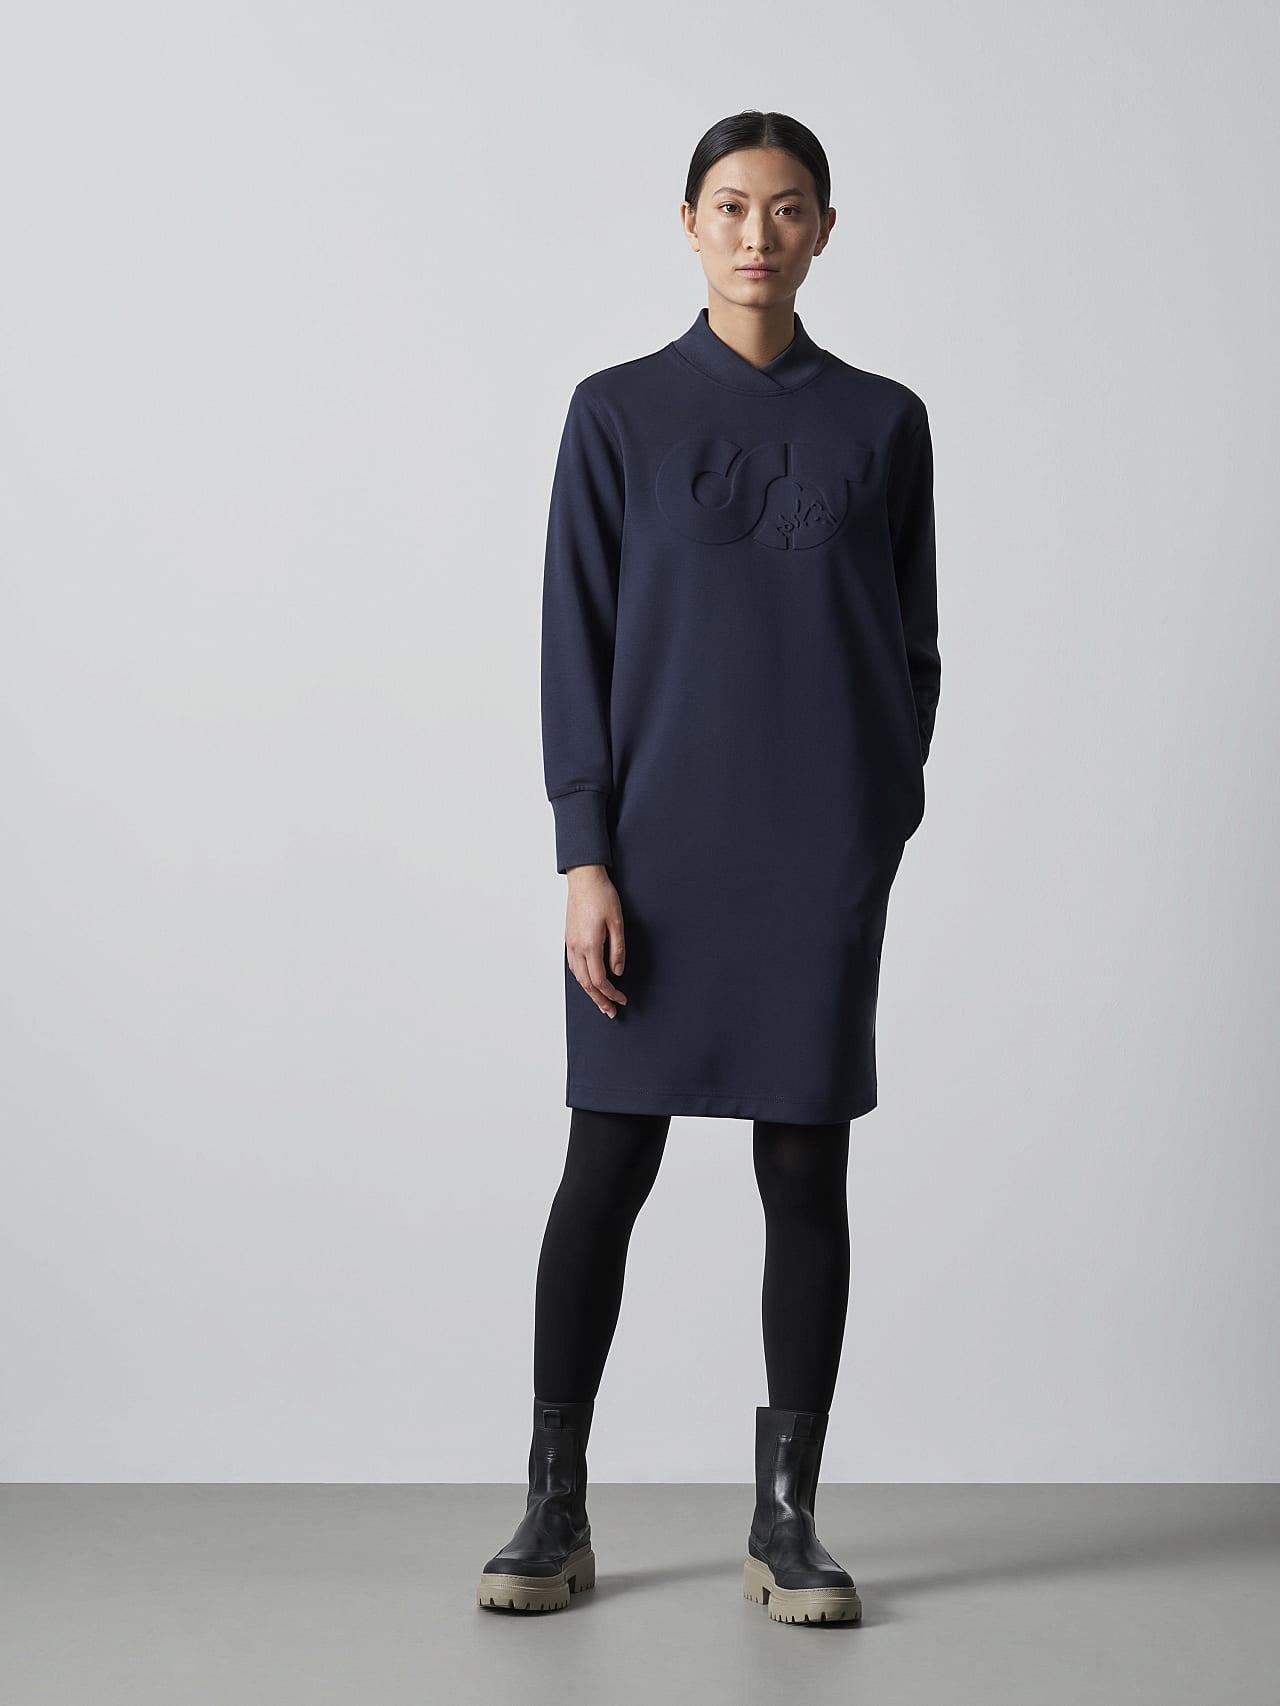 STAR V3.Y5.02 Premium Logo Sweater Dress navy Extra Alpha Tauri